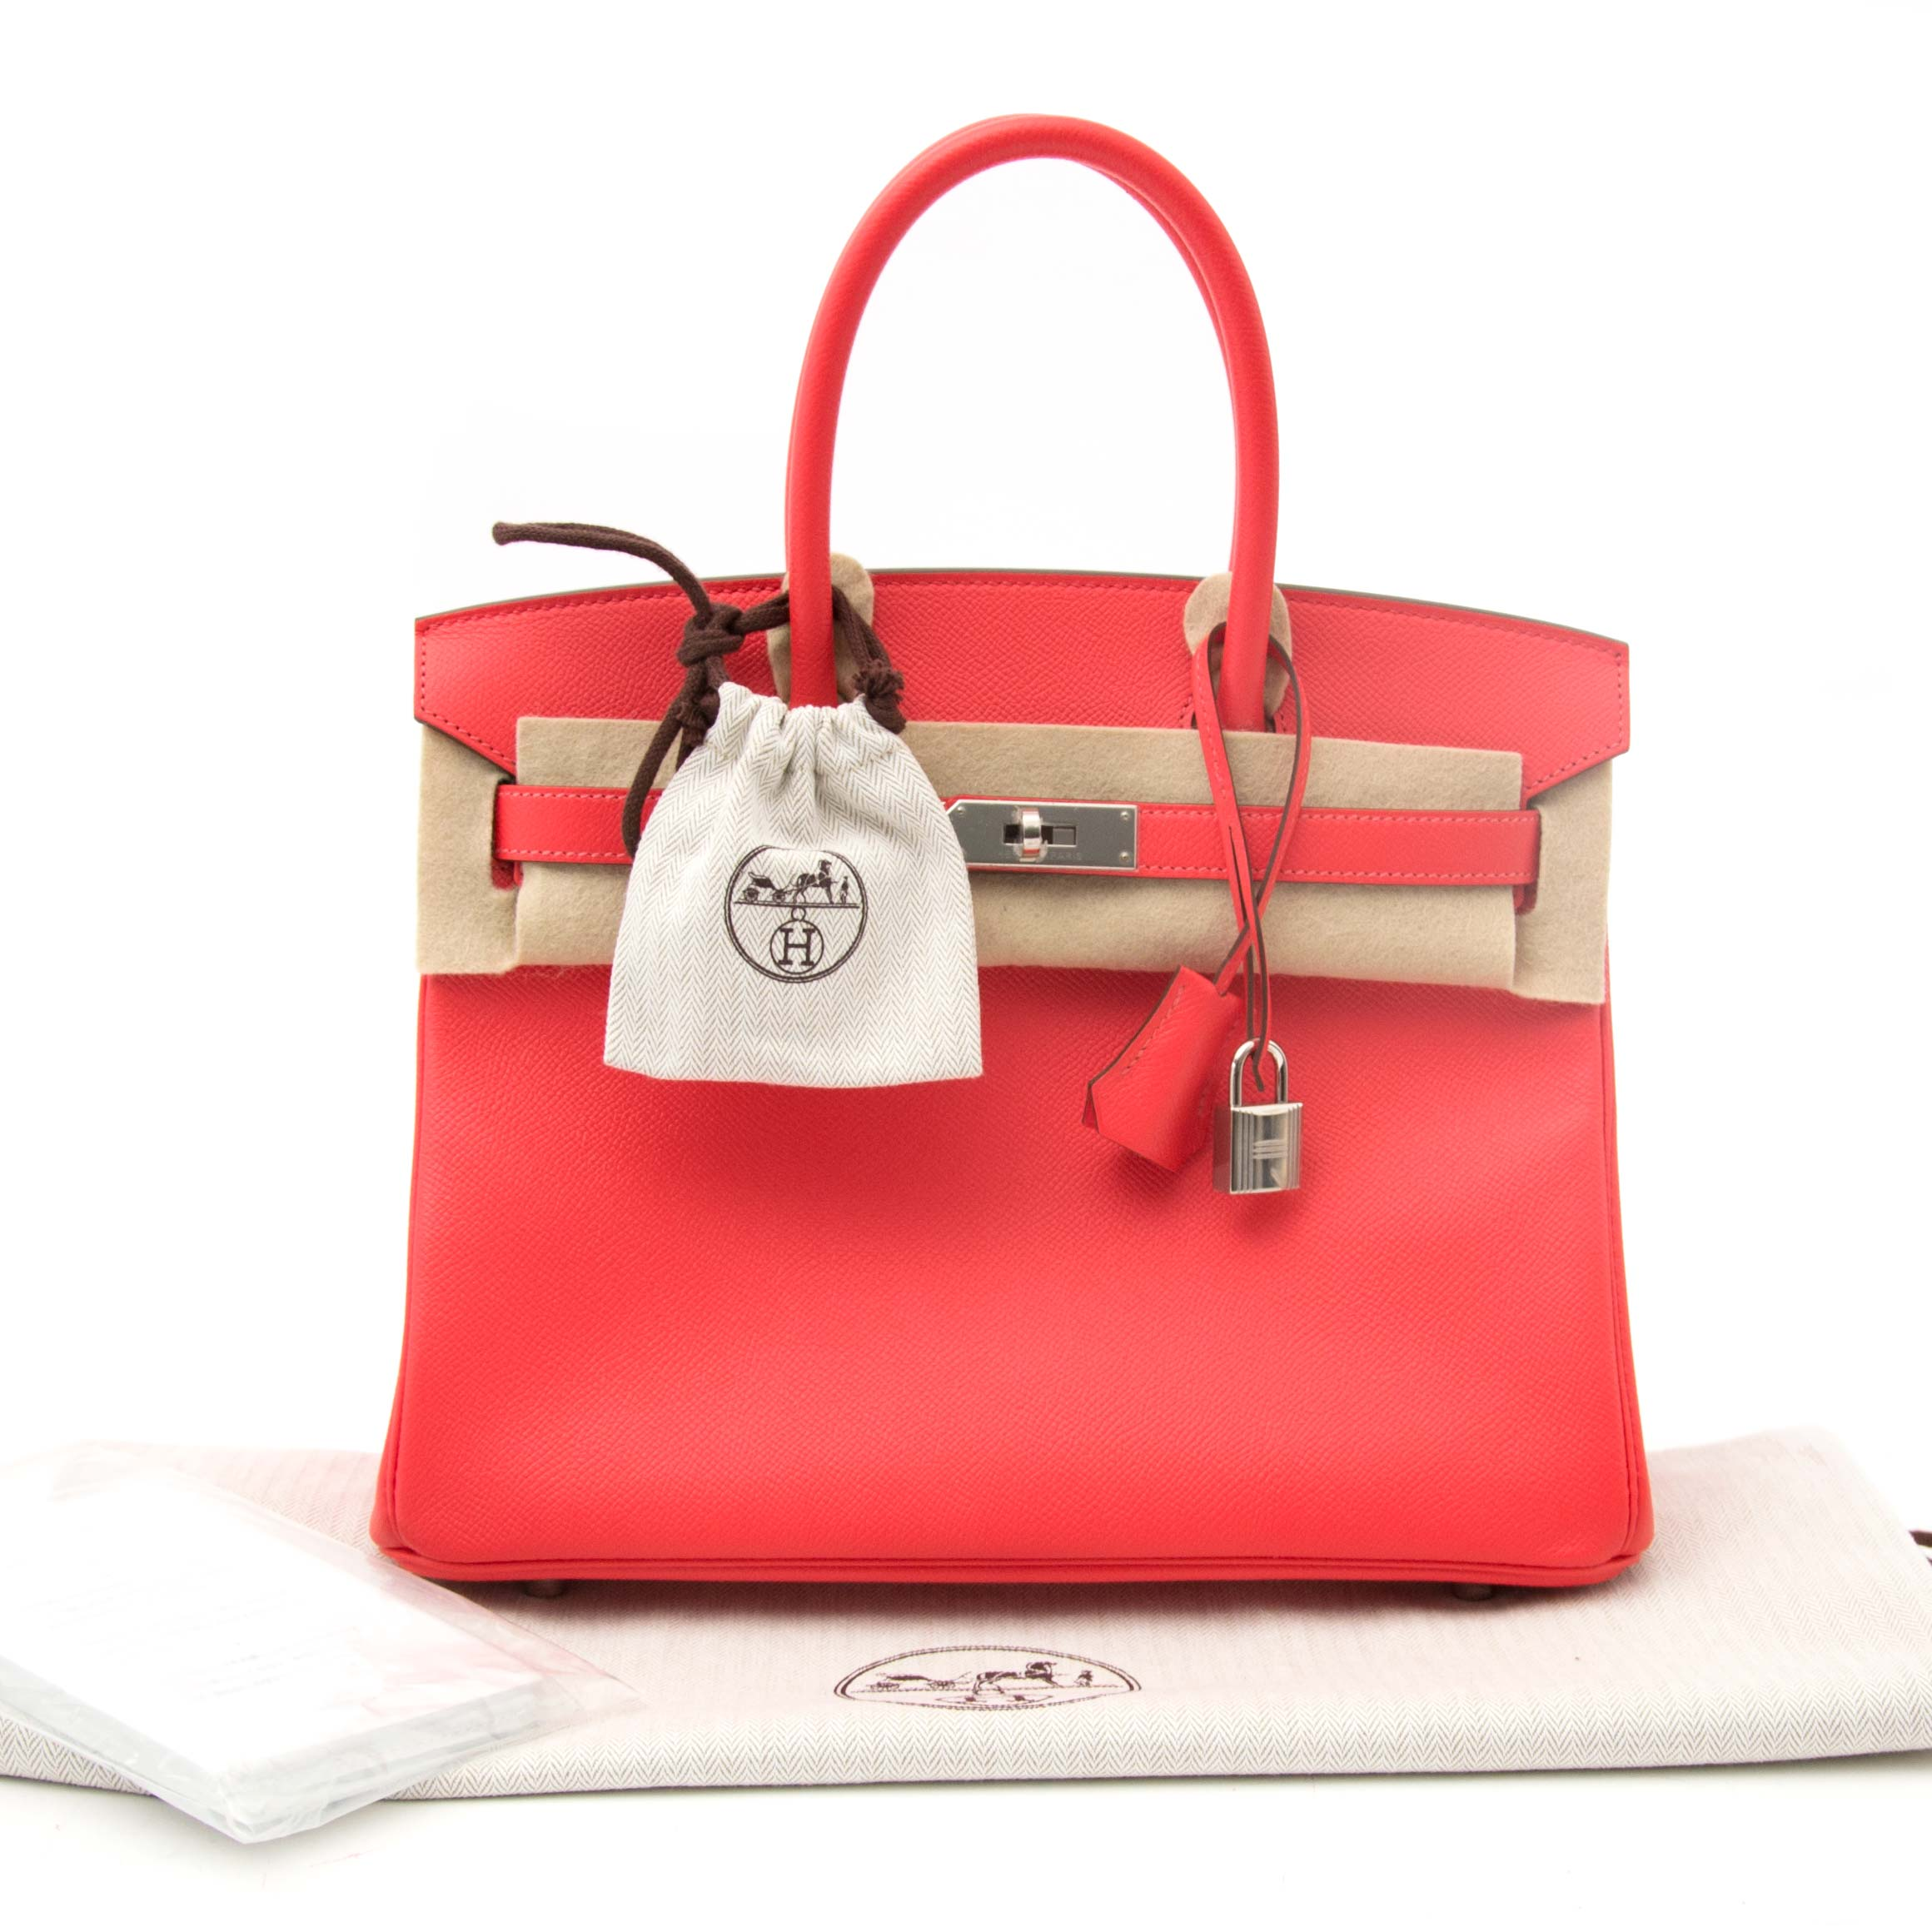 koop online aan d e beste prijs jou tweedehands Never Worn Hermes Birkin 30 Rose Jaipur Epsom PHW